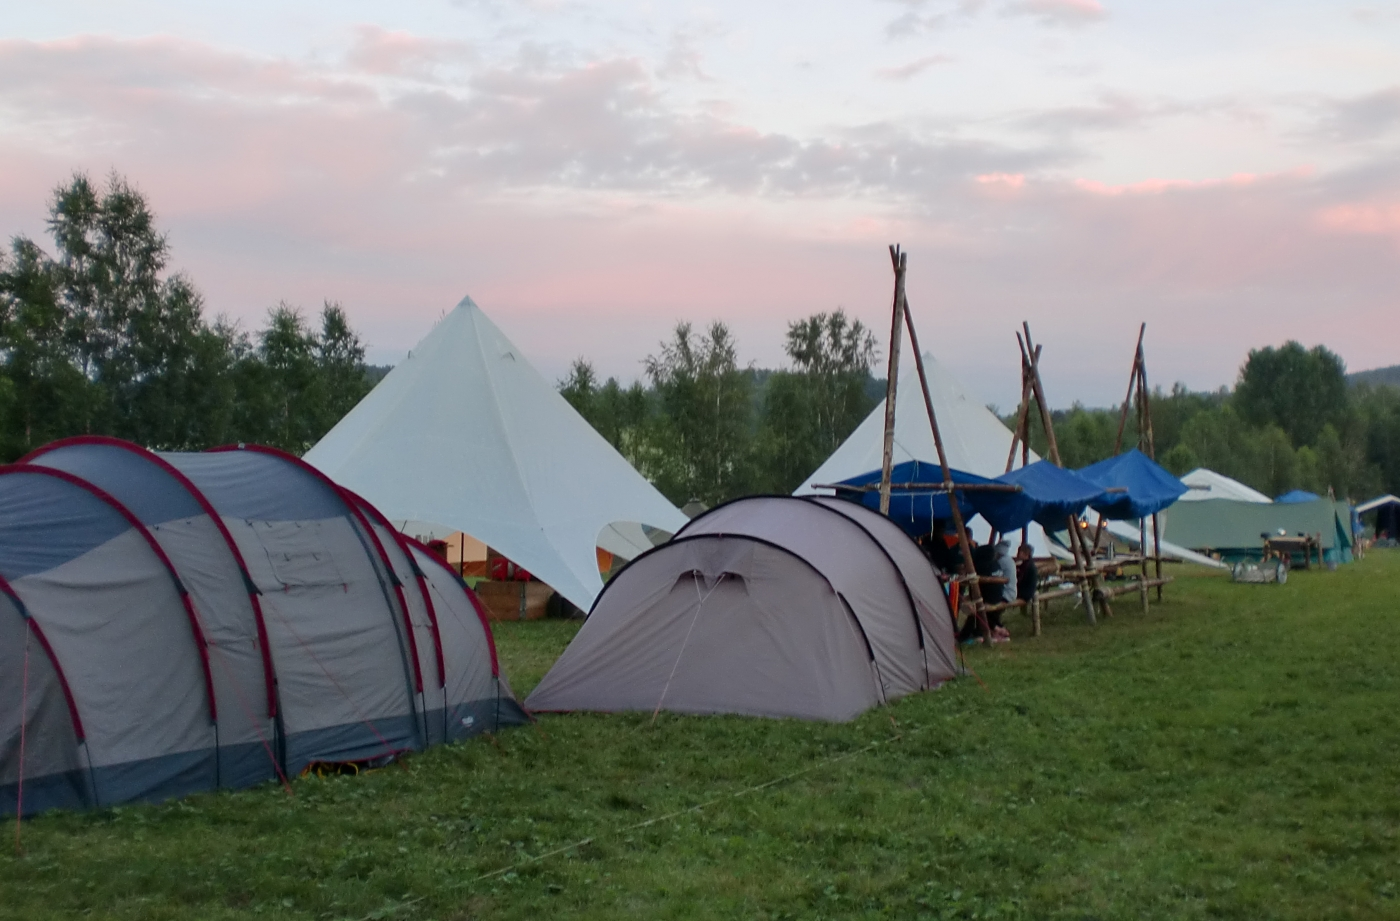 Västra Scoutdistriktet